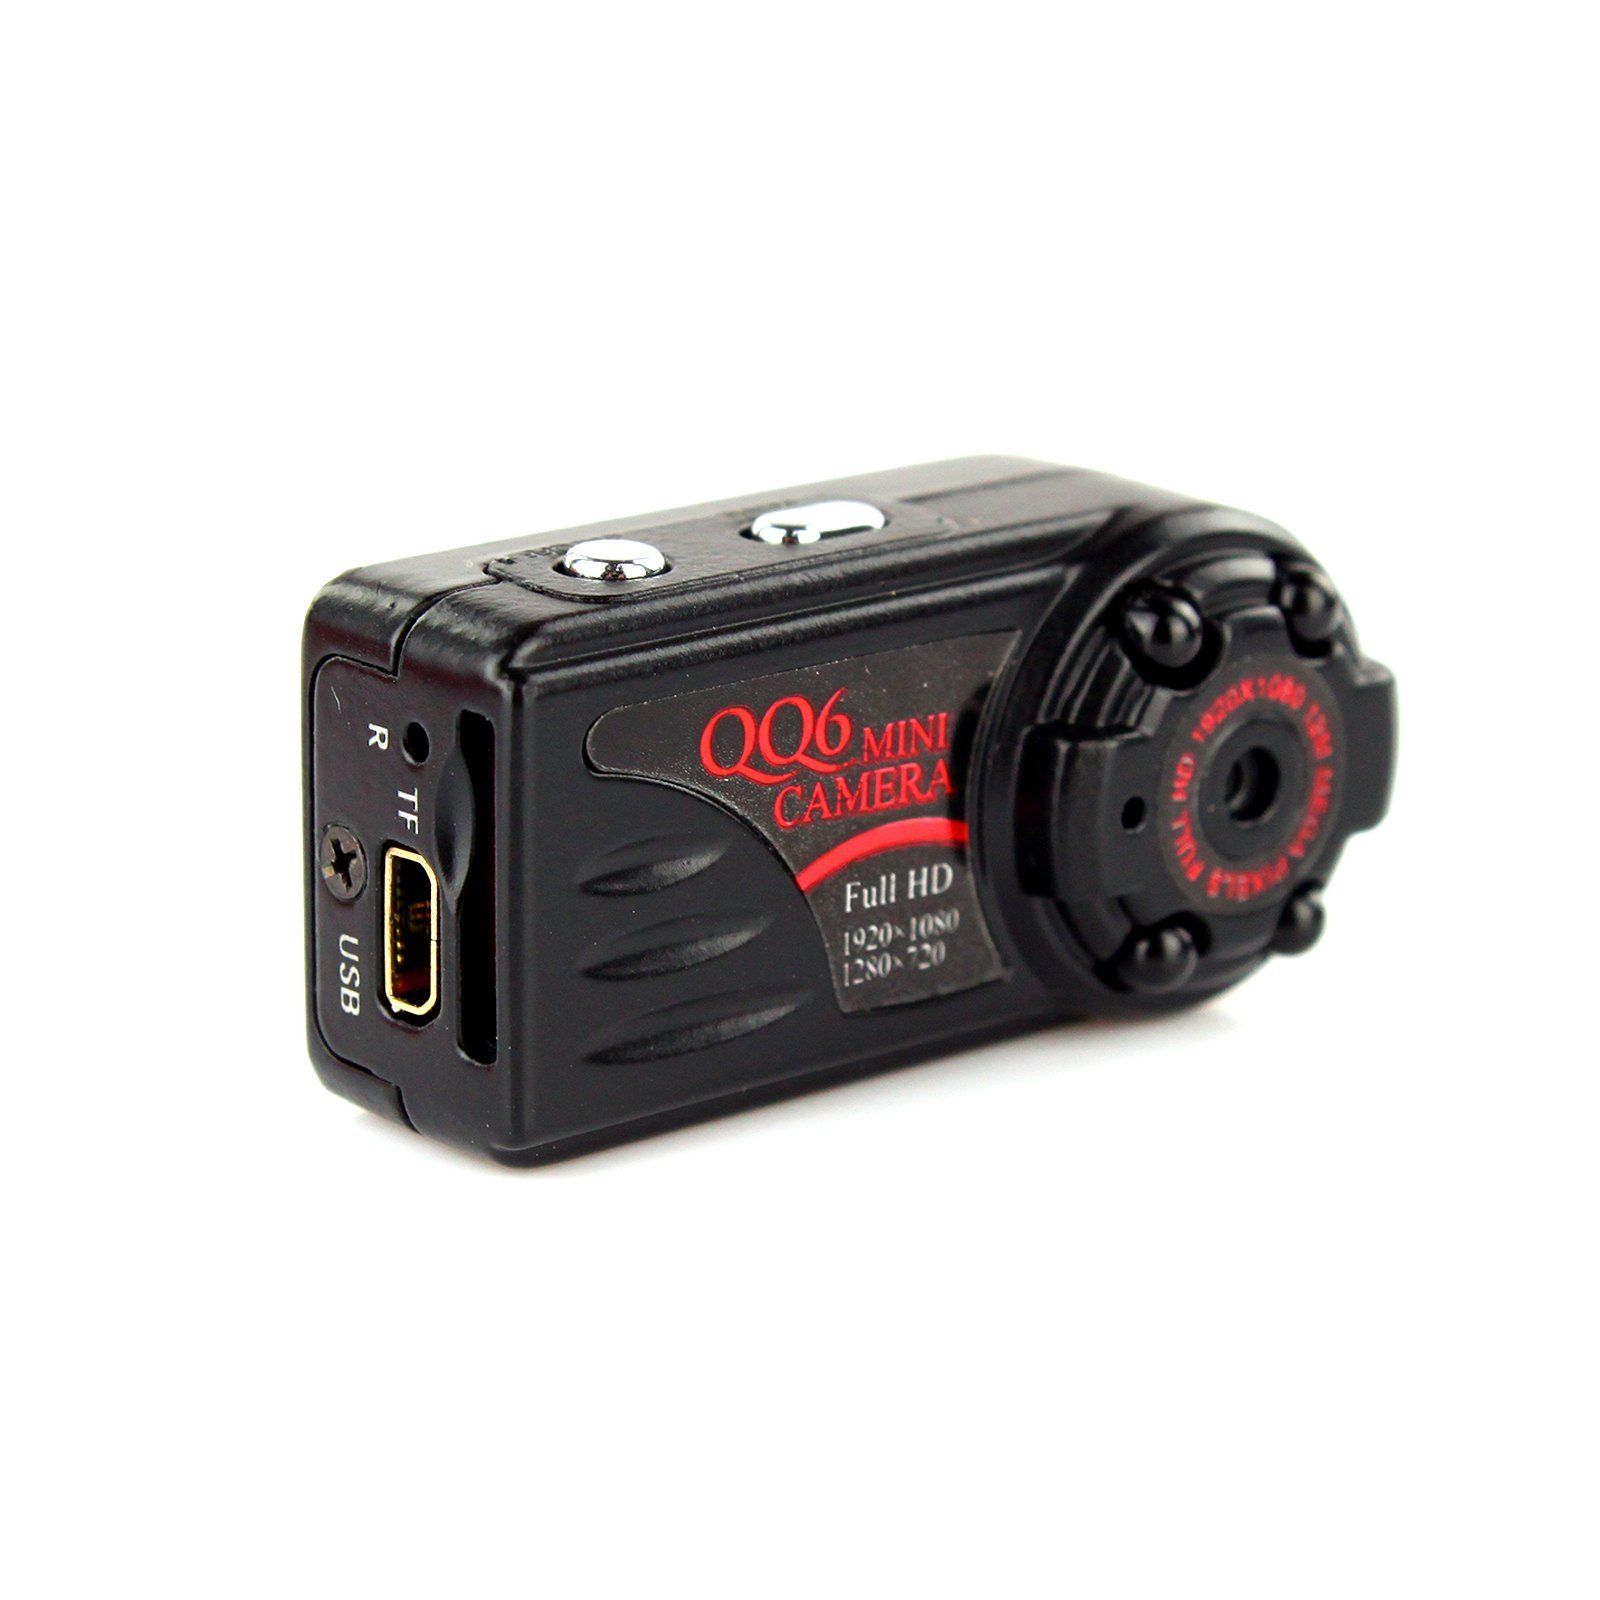 4GB Card+QQ6 Mini DV Full HD 1080P Digital Car Video Recorder Thumb Metal Mini Camera lc 08 mini dv headphone 1080p hd sport dv bluetooth headset stereo neck strap video recorder